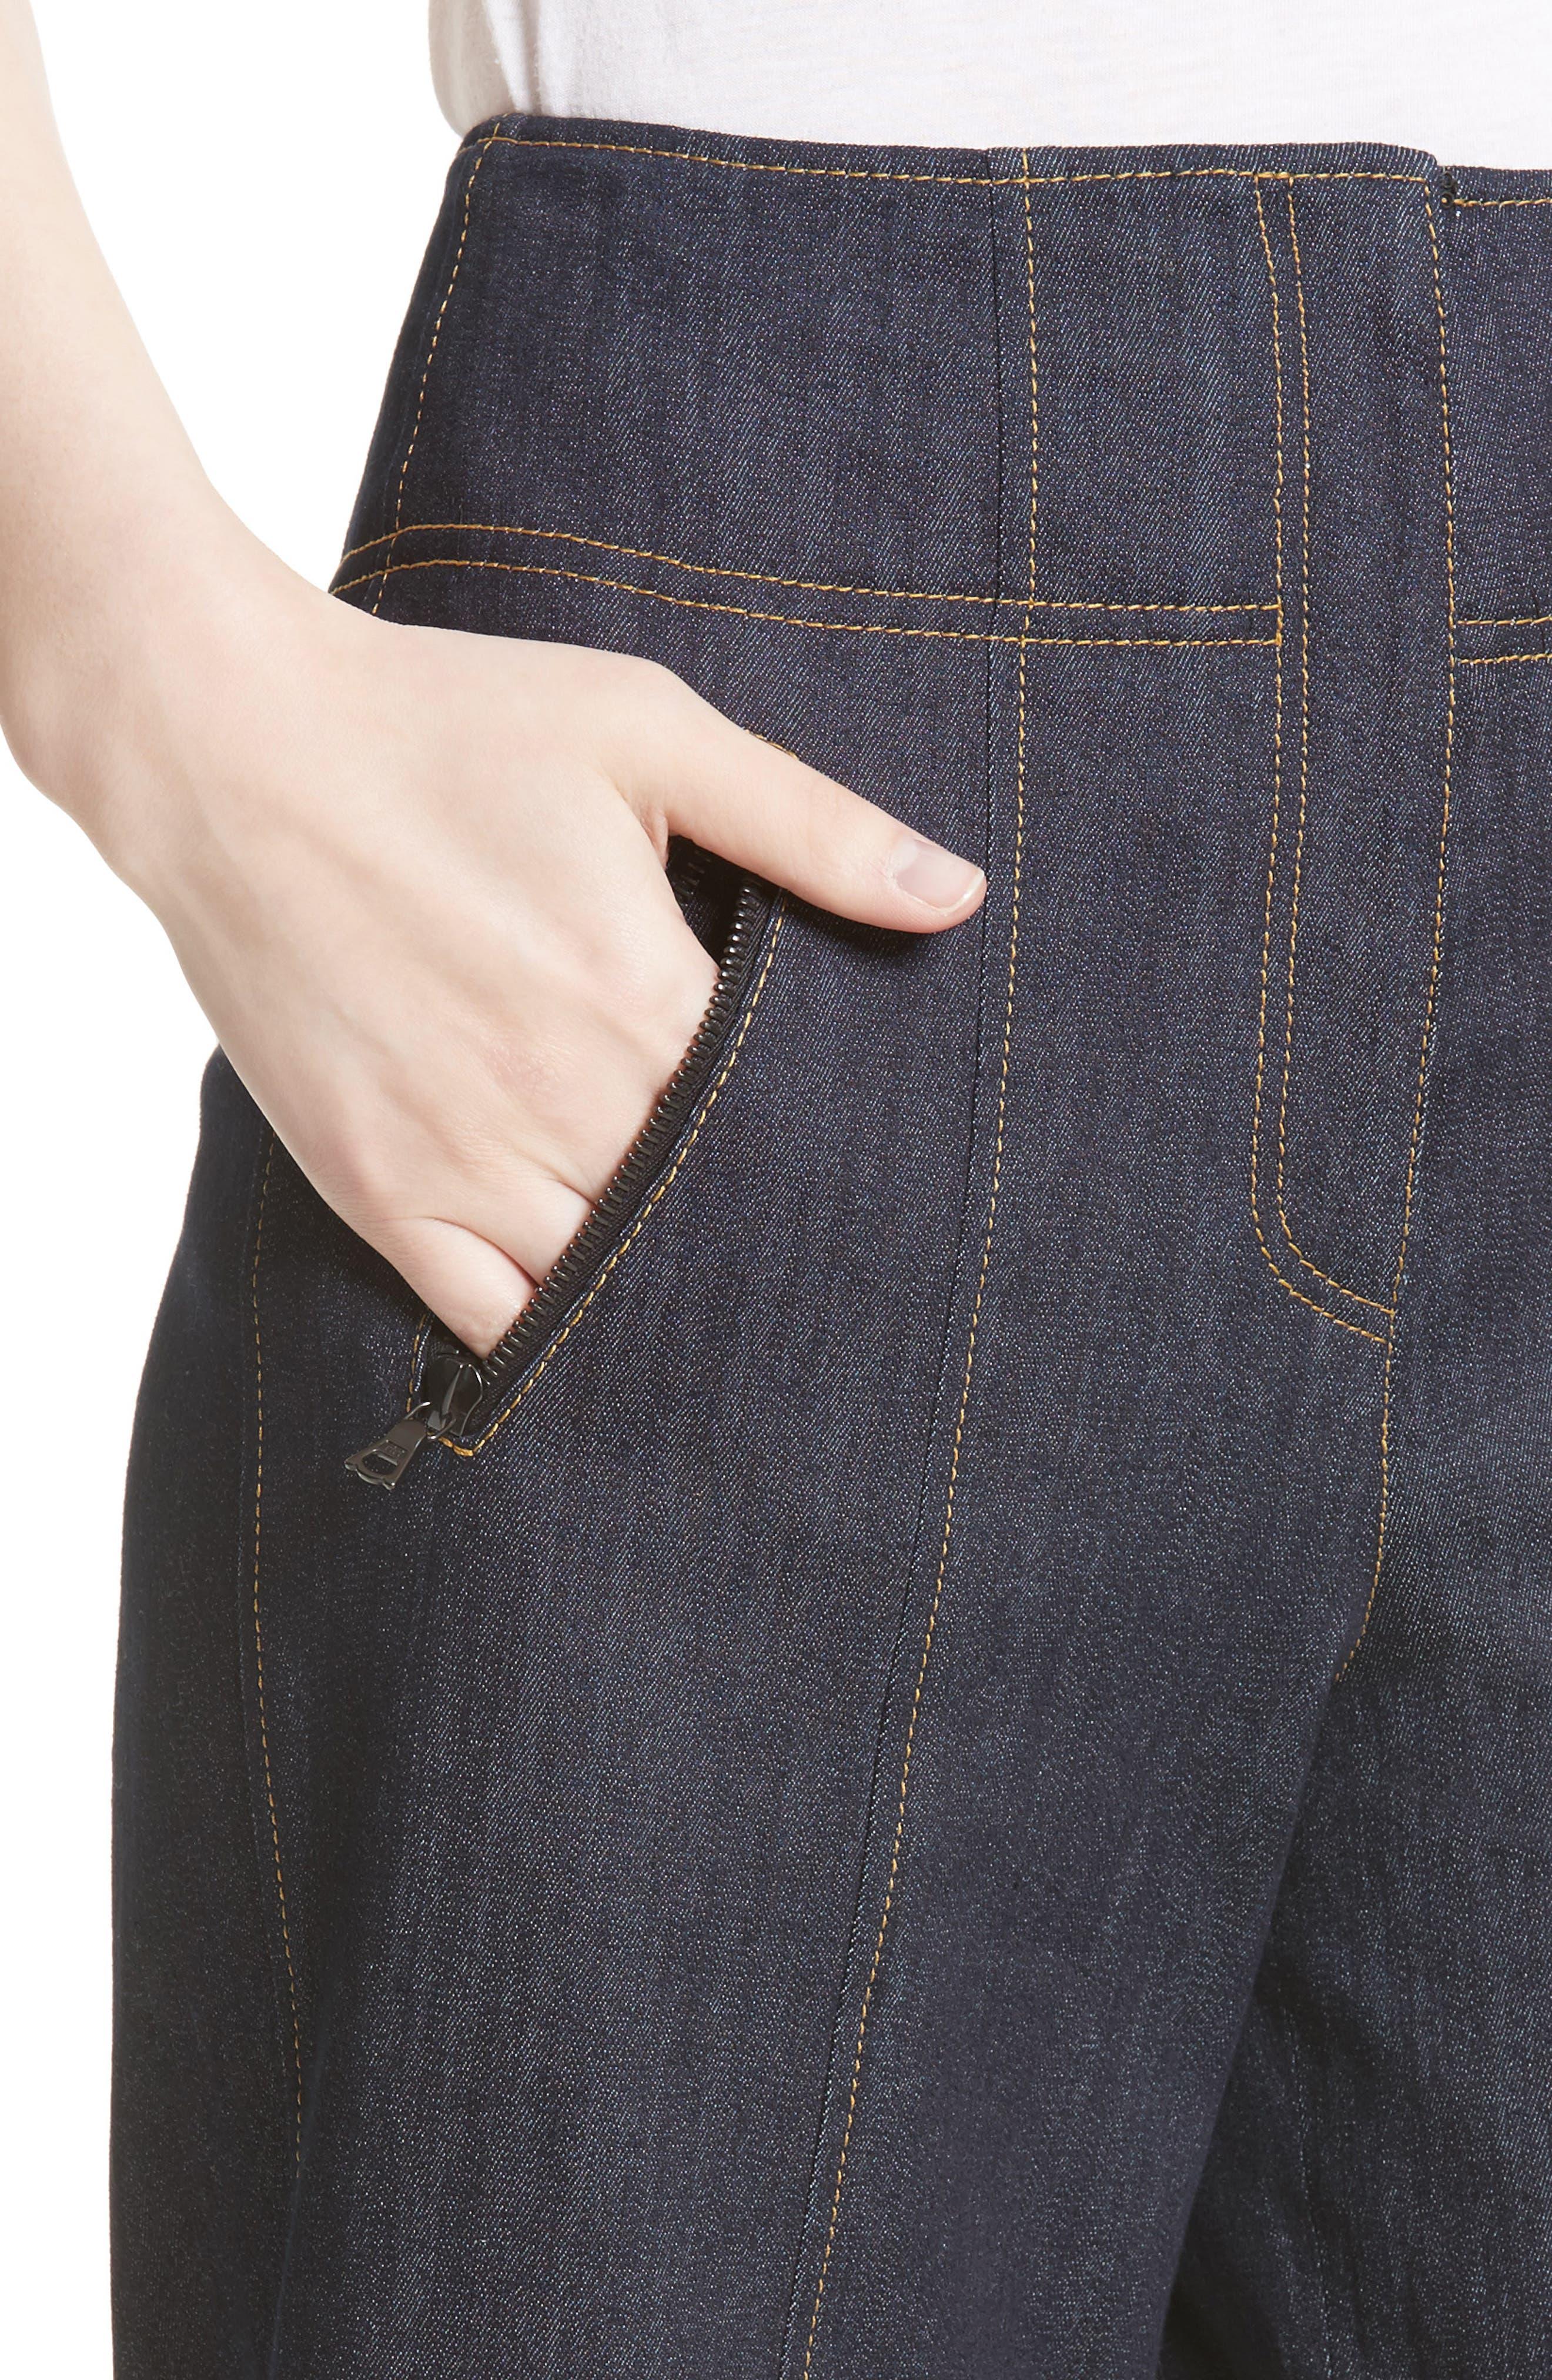 Marla Cuff Jeans,                             Alternate thumbnail 4, color,                             422